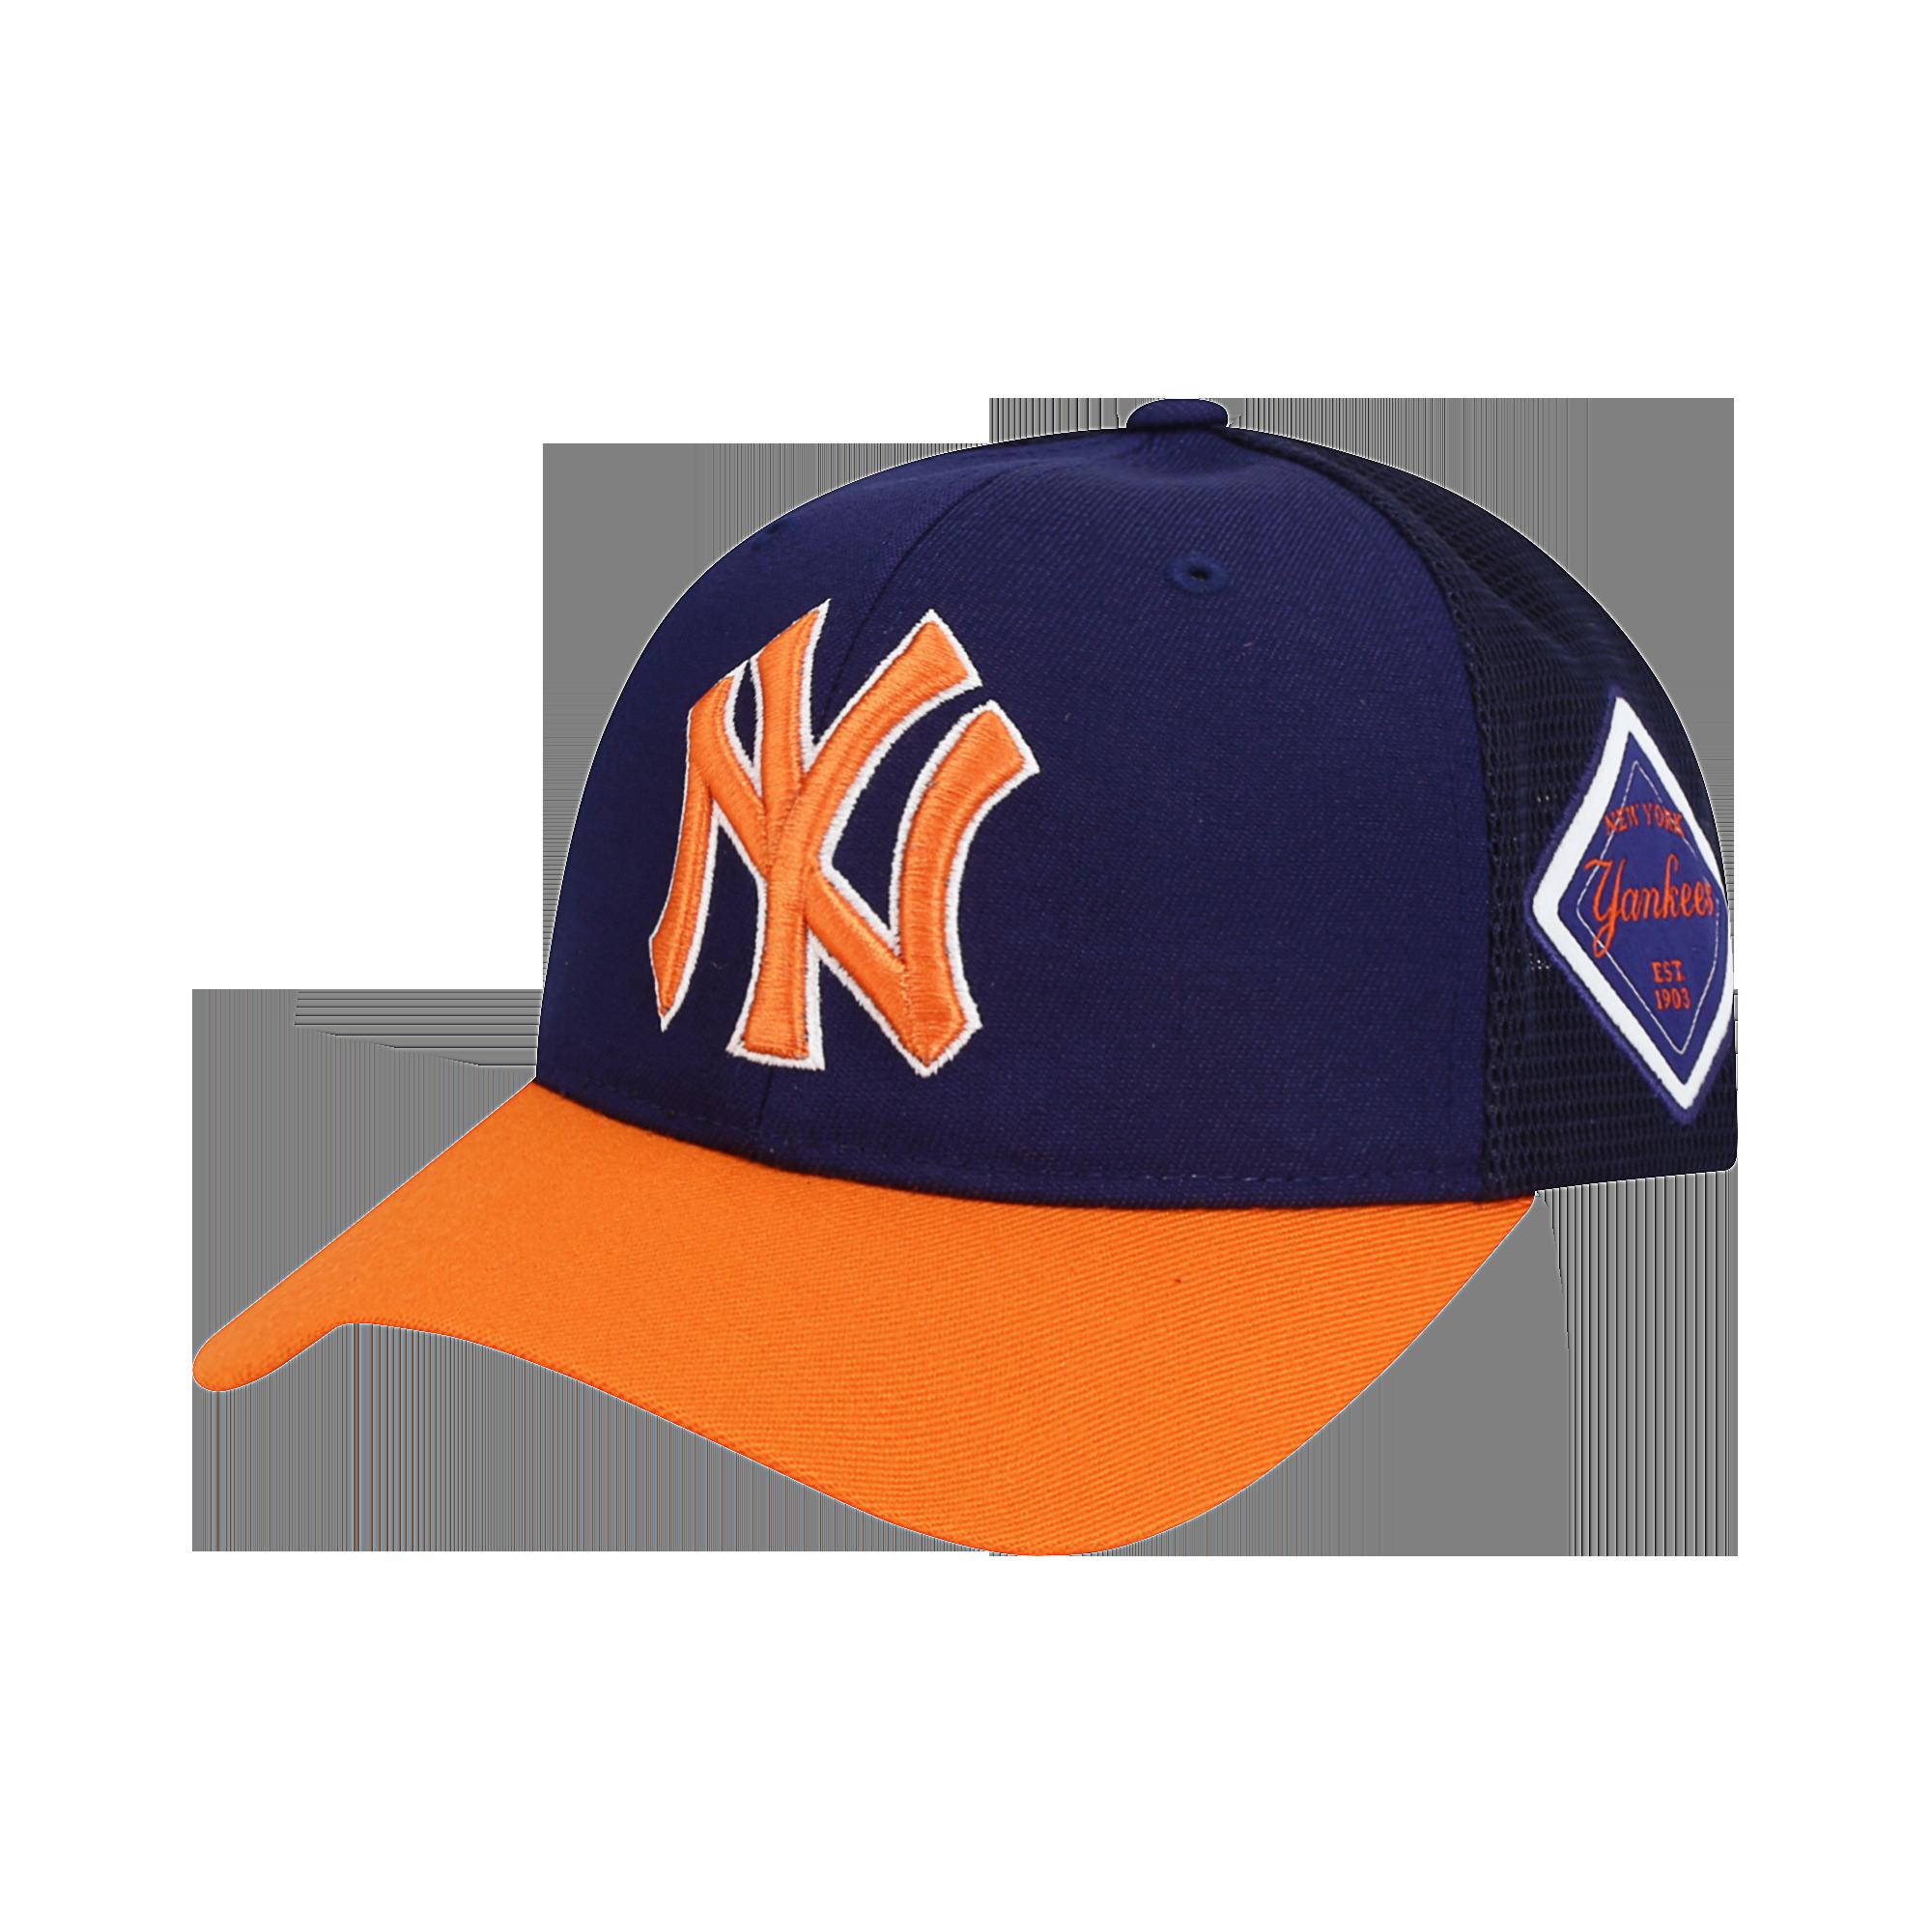 NEW YORK YANKEES BASIC MESH CURVED CAP